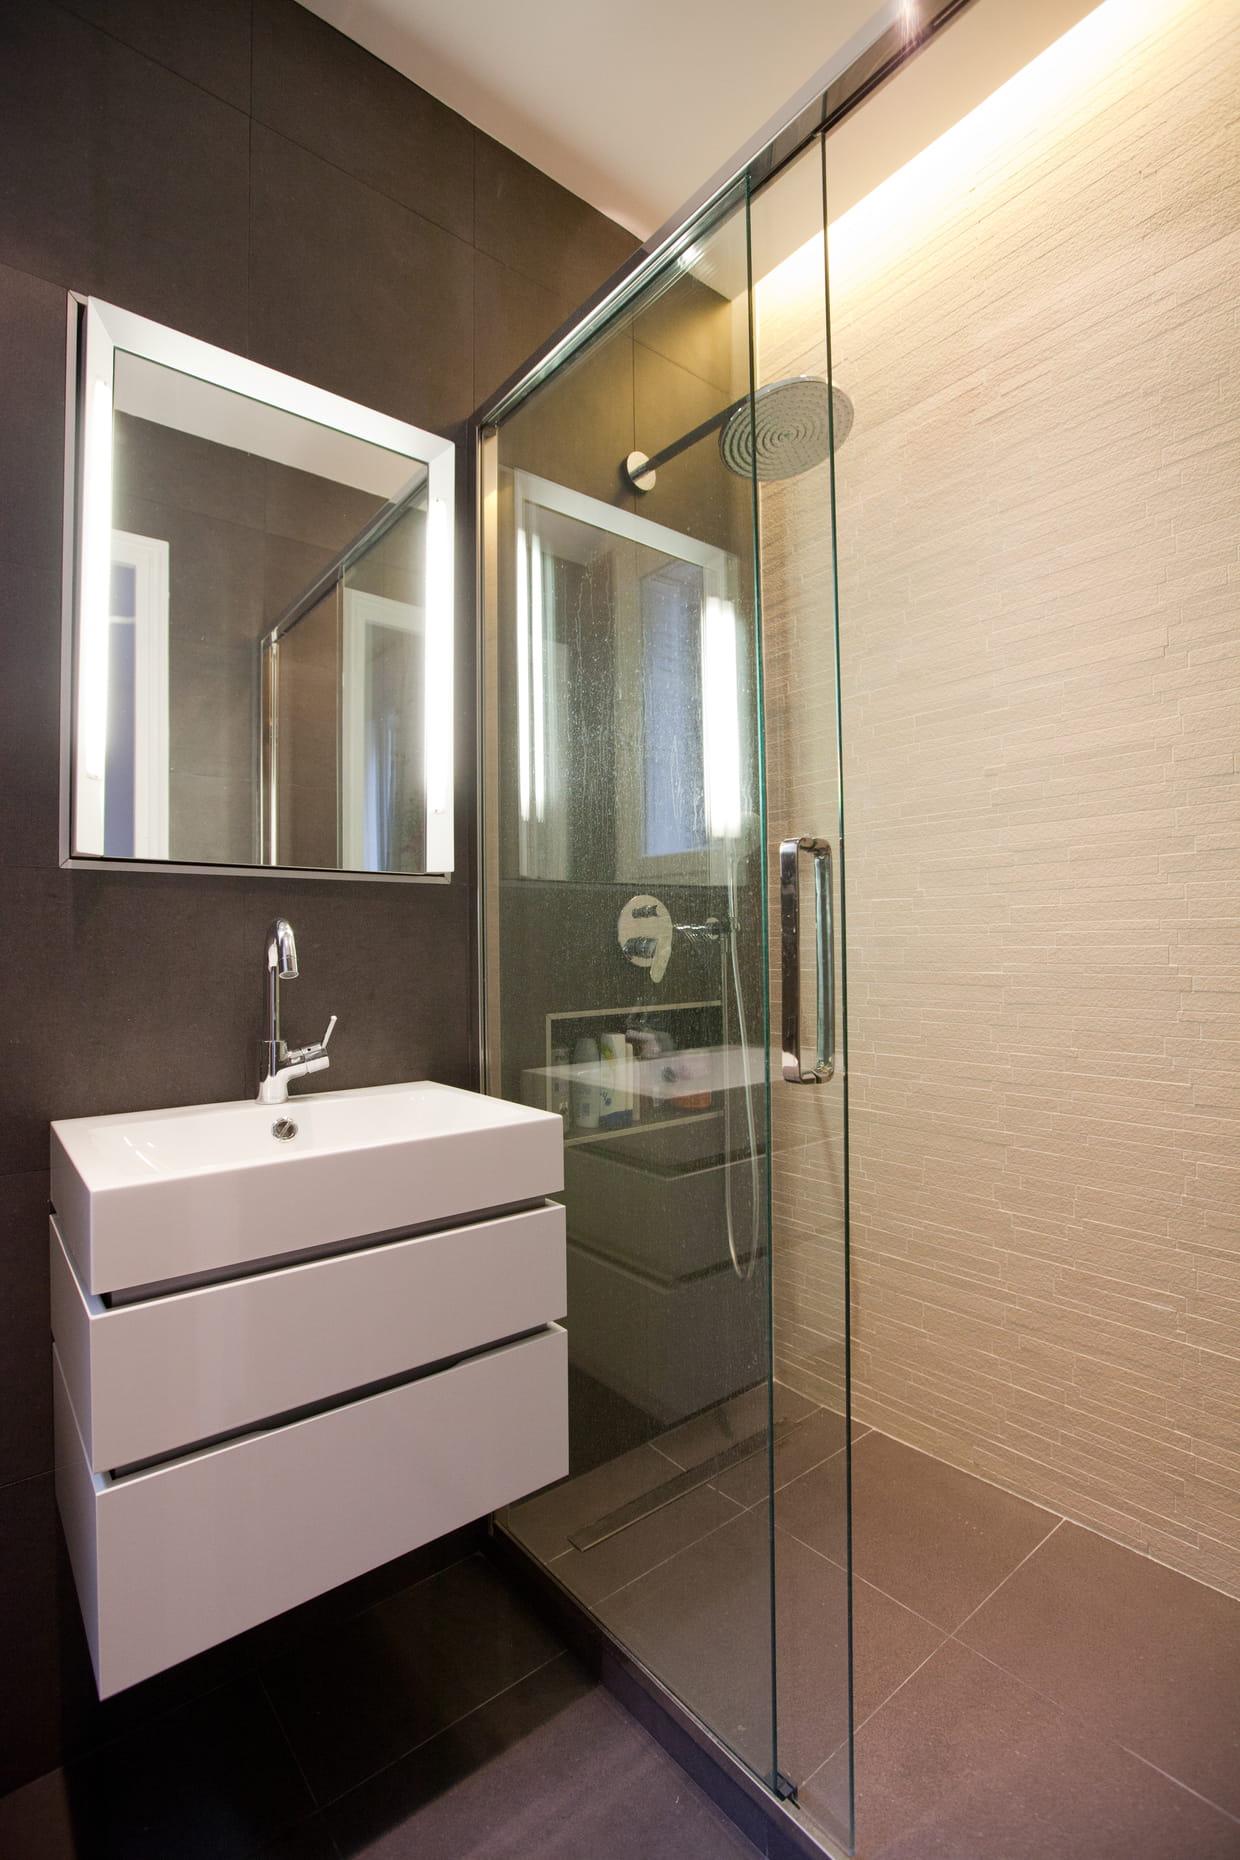 Petite salle de bains calme et graphique - Plan de petite salle de bain ...